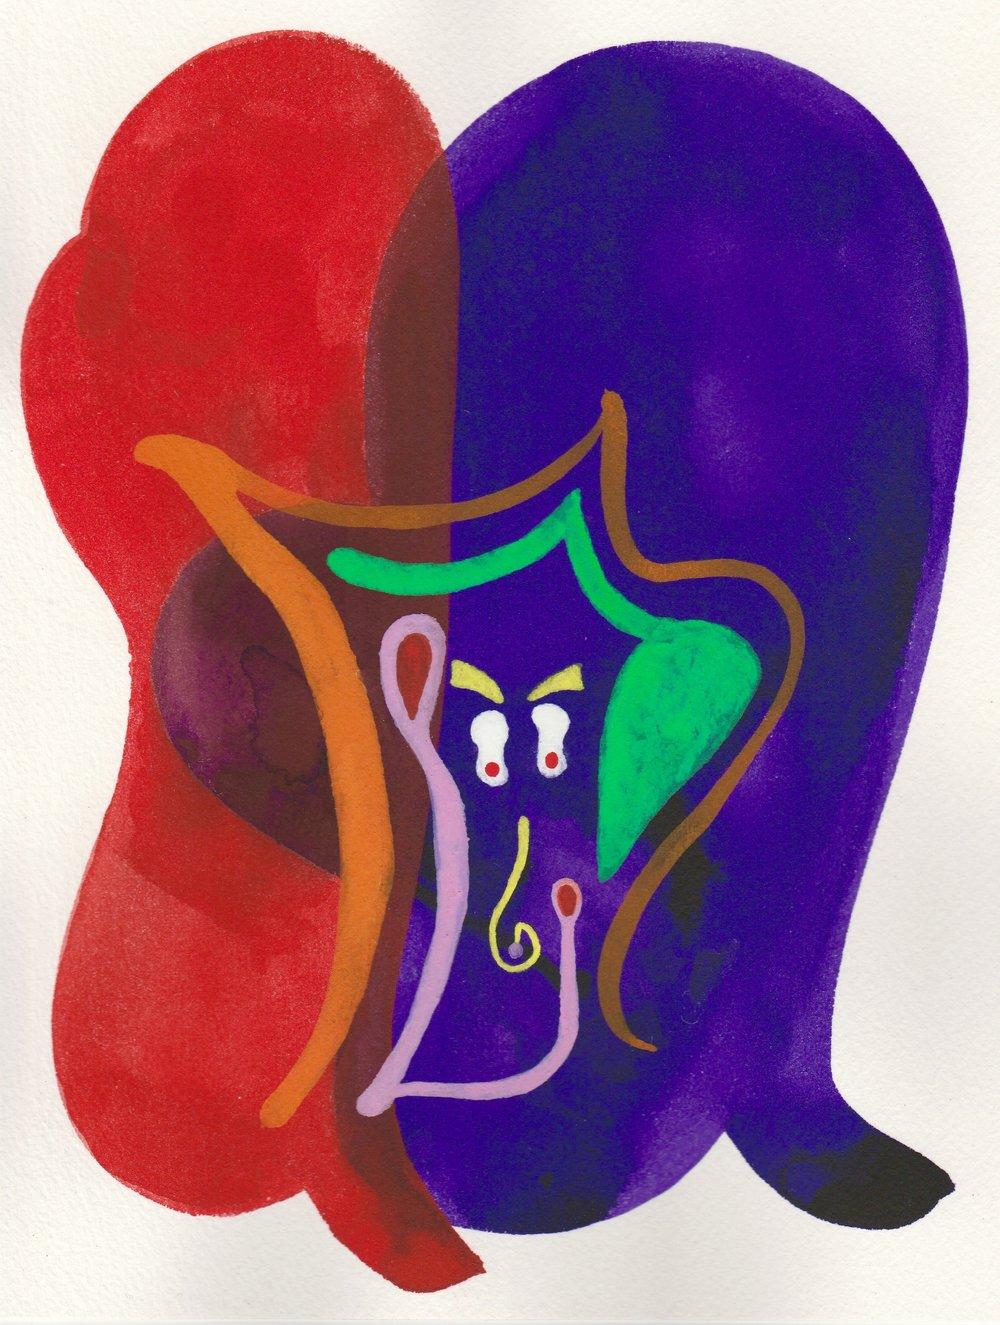 FaceTime #5   2017  Watercolor, Guache  8.5 x 11 inches